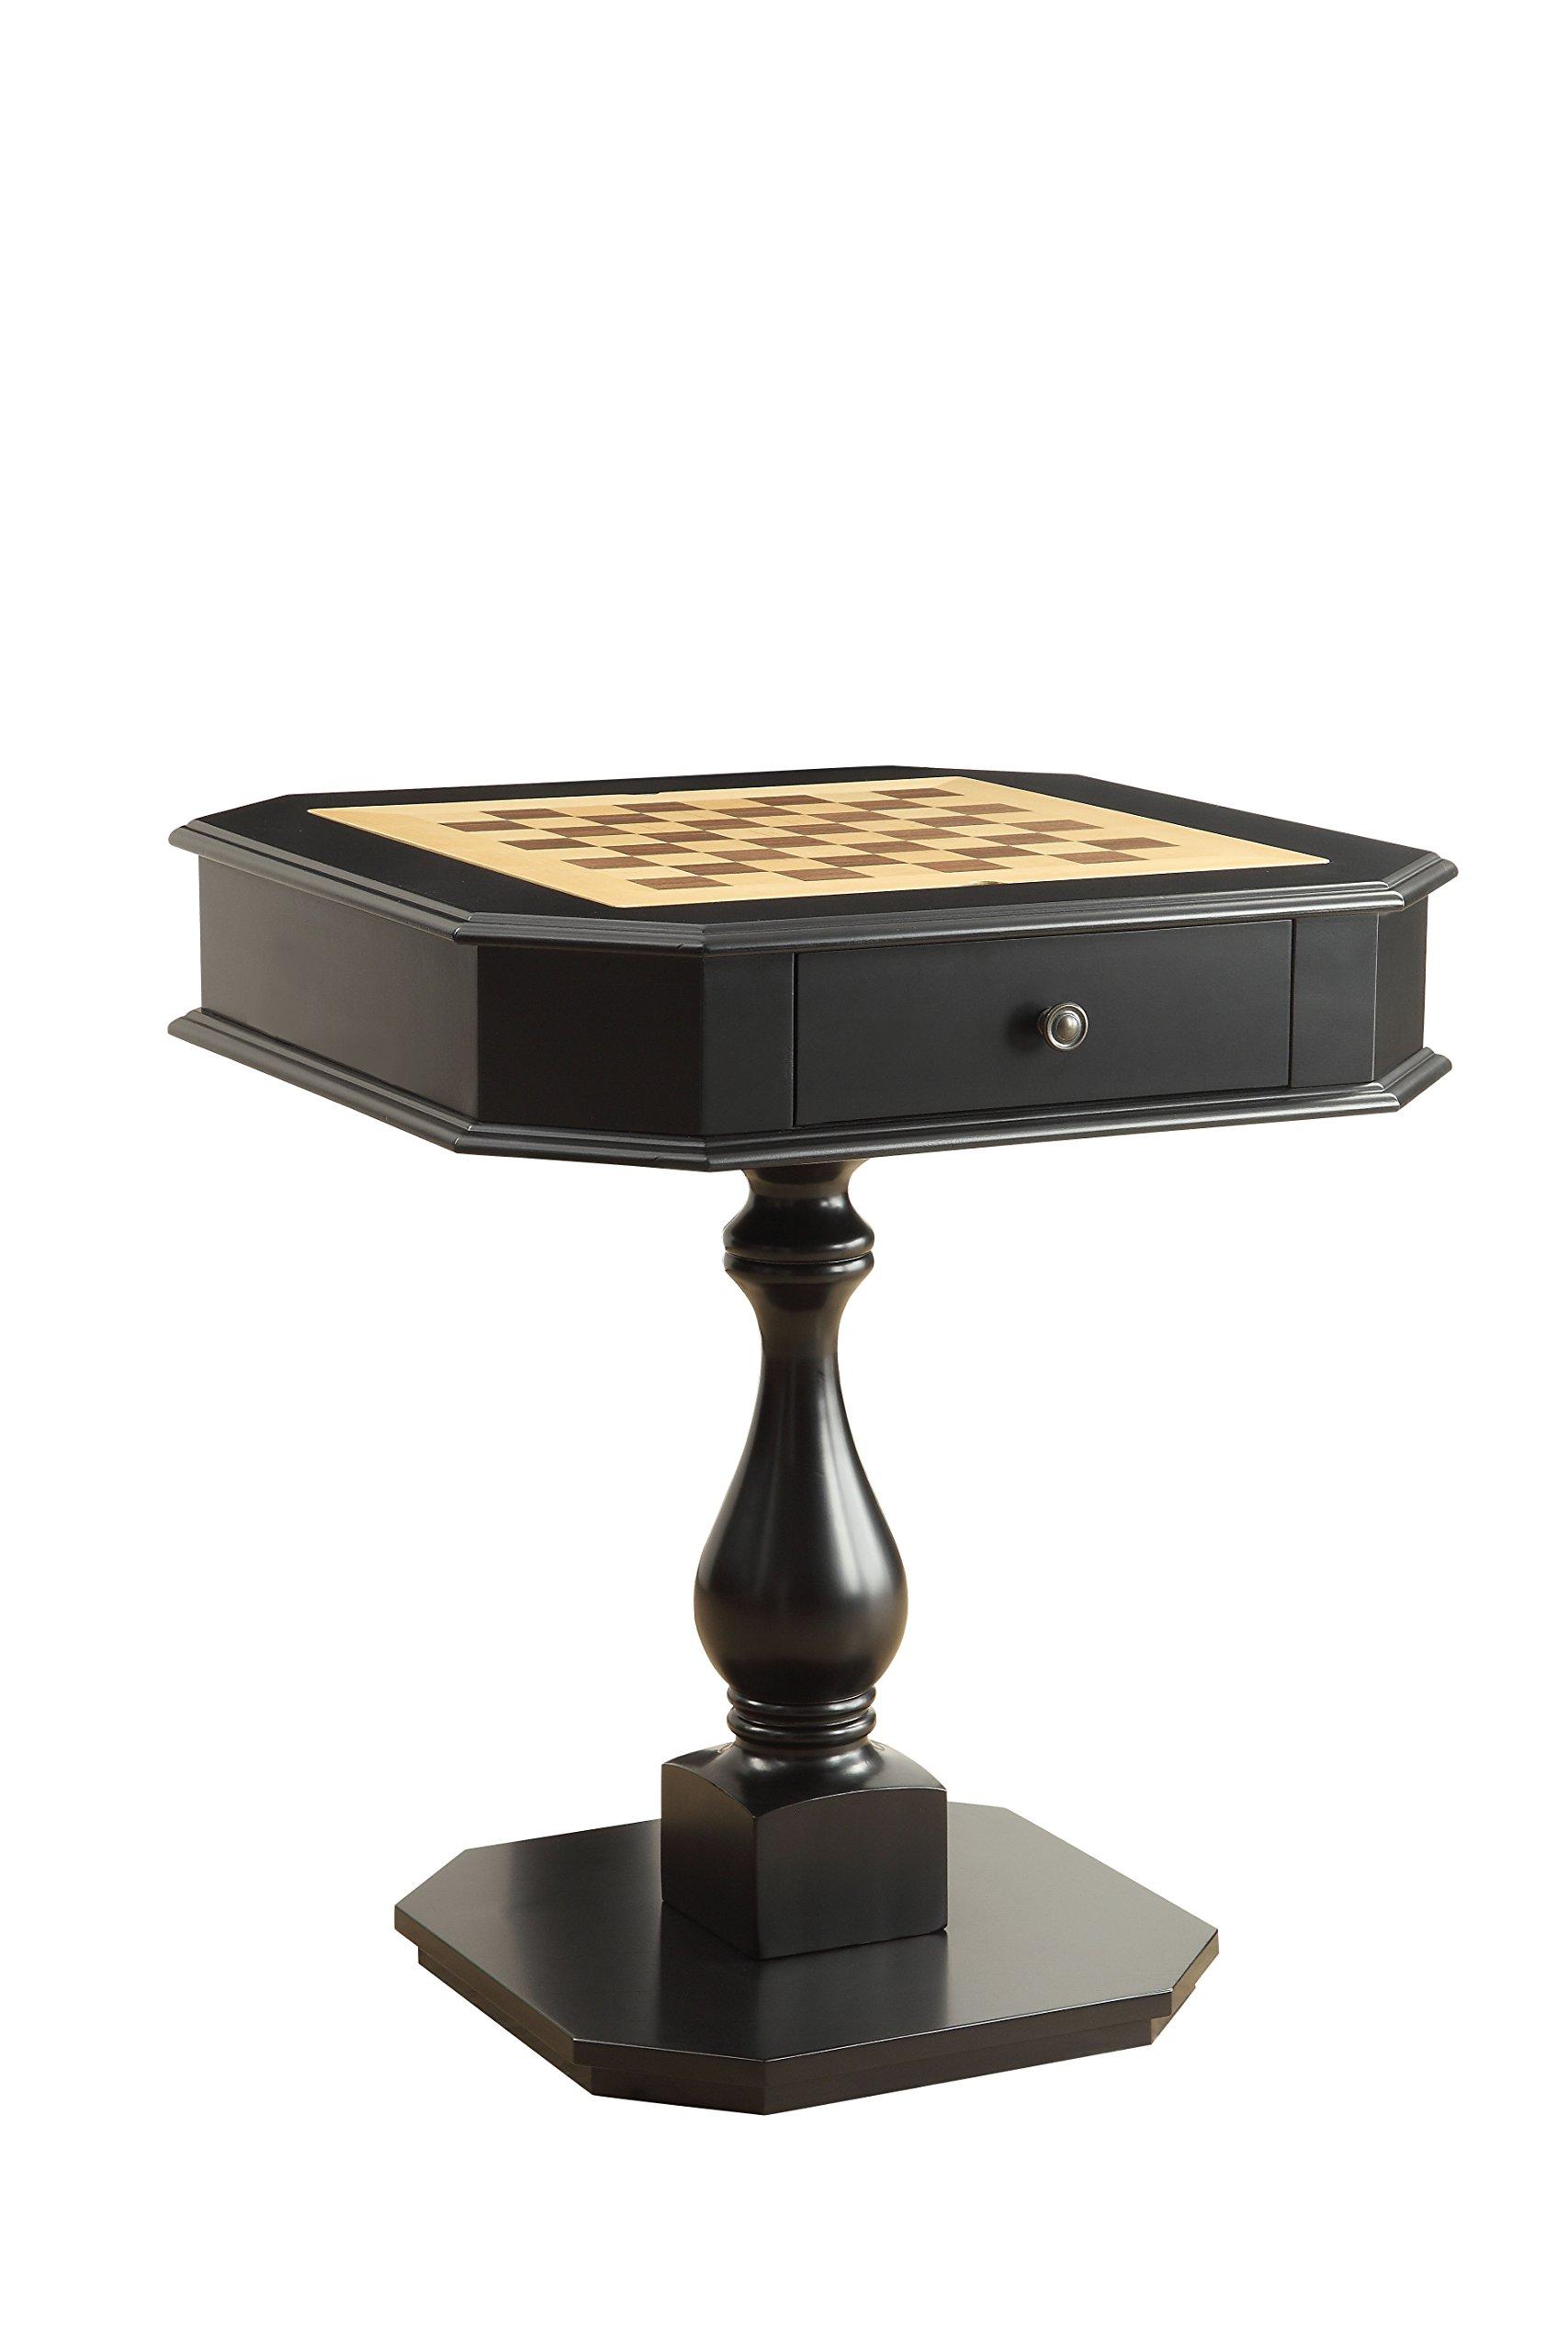 ACME Furniture Acme 82846 Bishop Game Table, Black, One Size